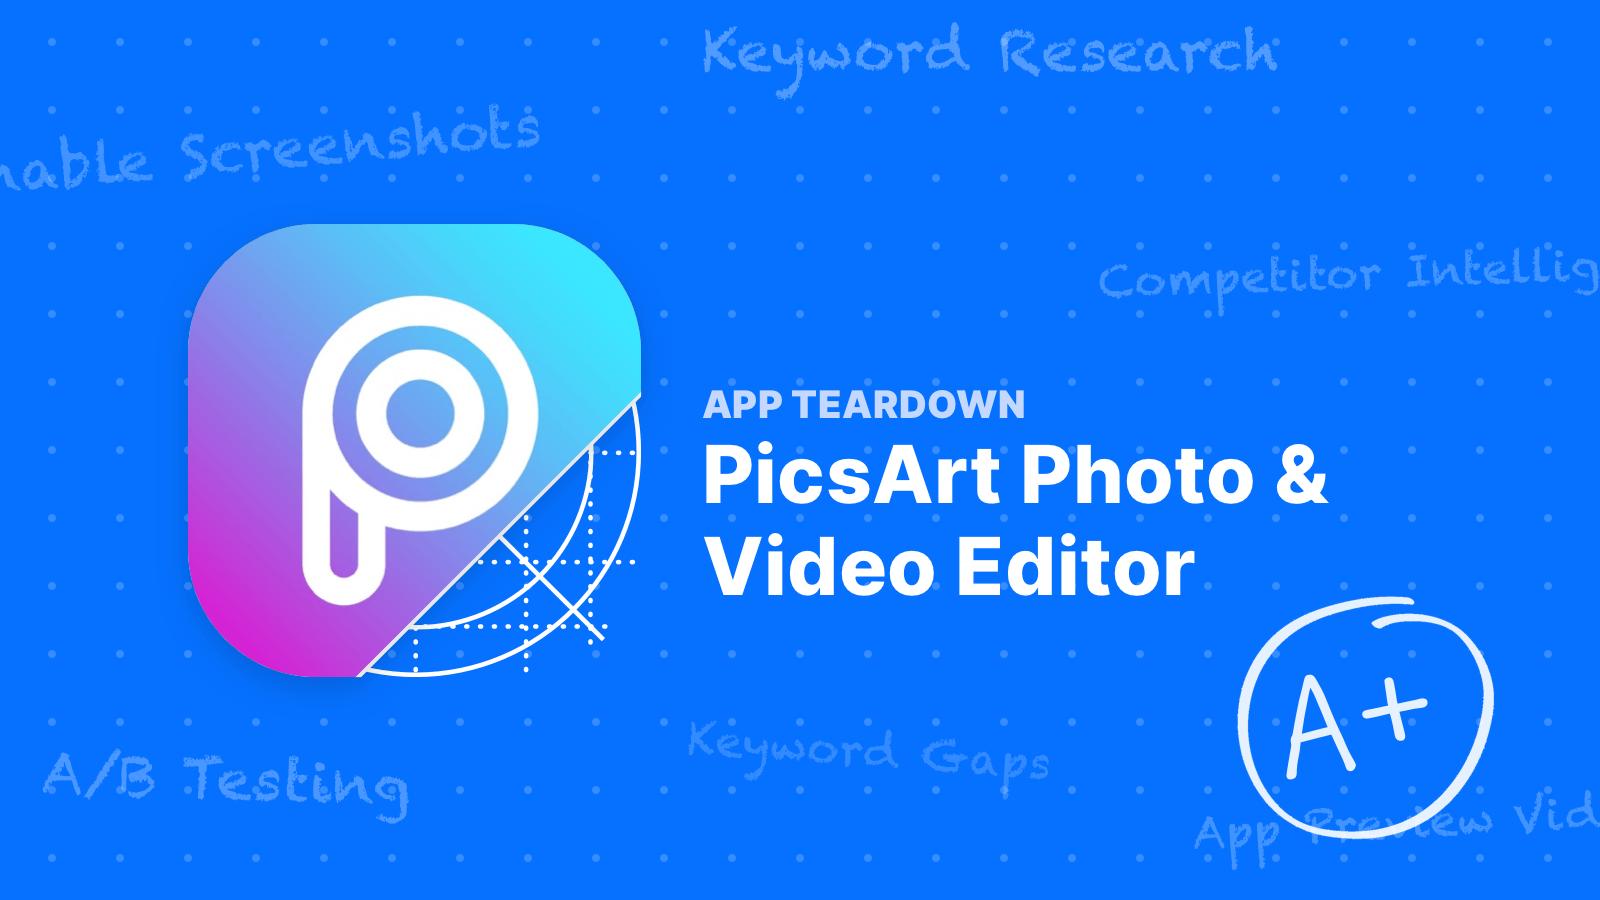 ASO Teardown: PicsArt Does A Wonderful Job Getting Downloads on the App Store